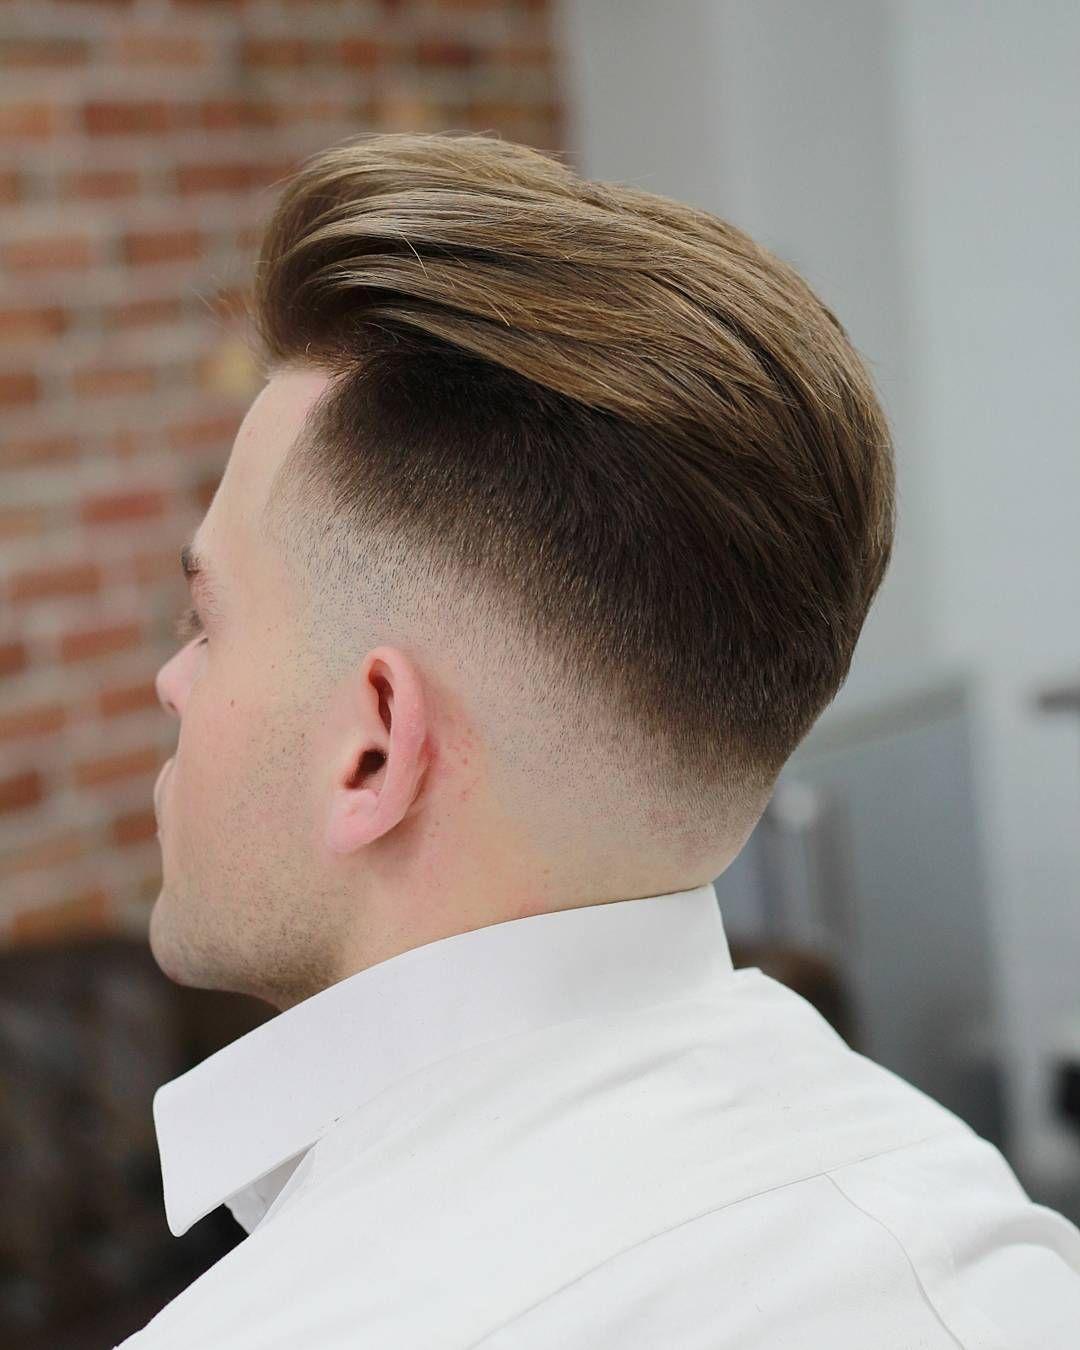 Pinterest mens haircuts ruben djirlauw barberdjirlauw u fotos y vídeos de instagram